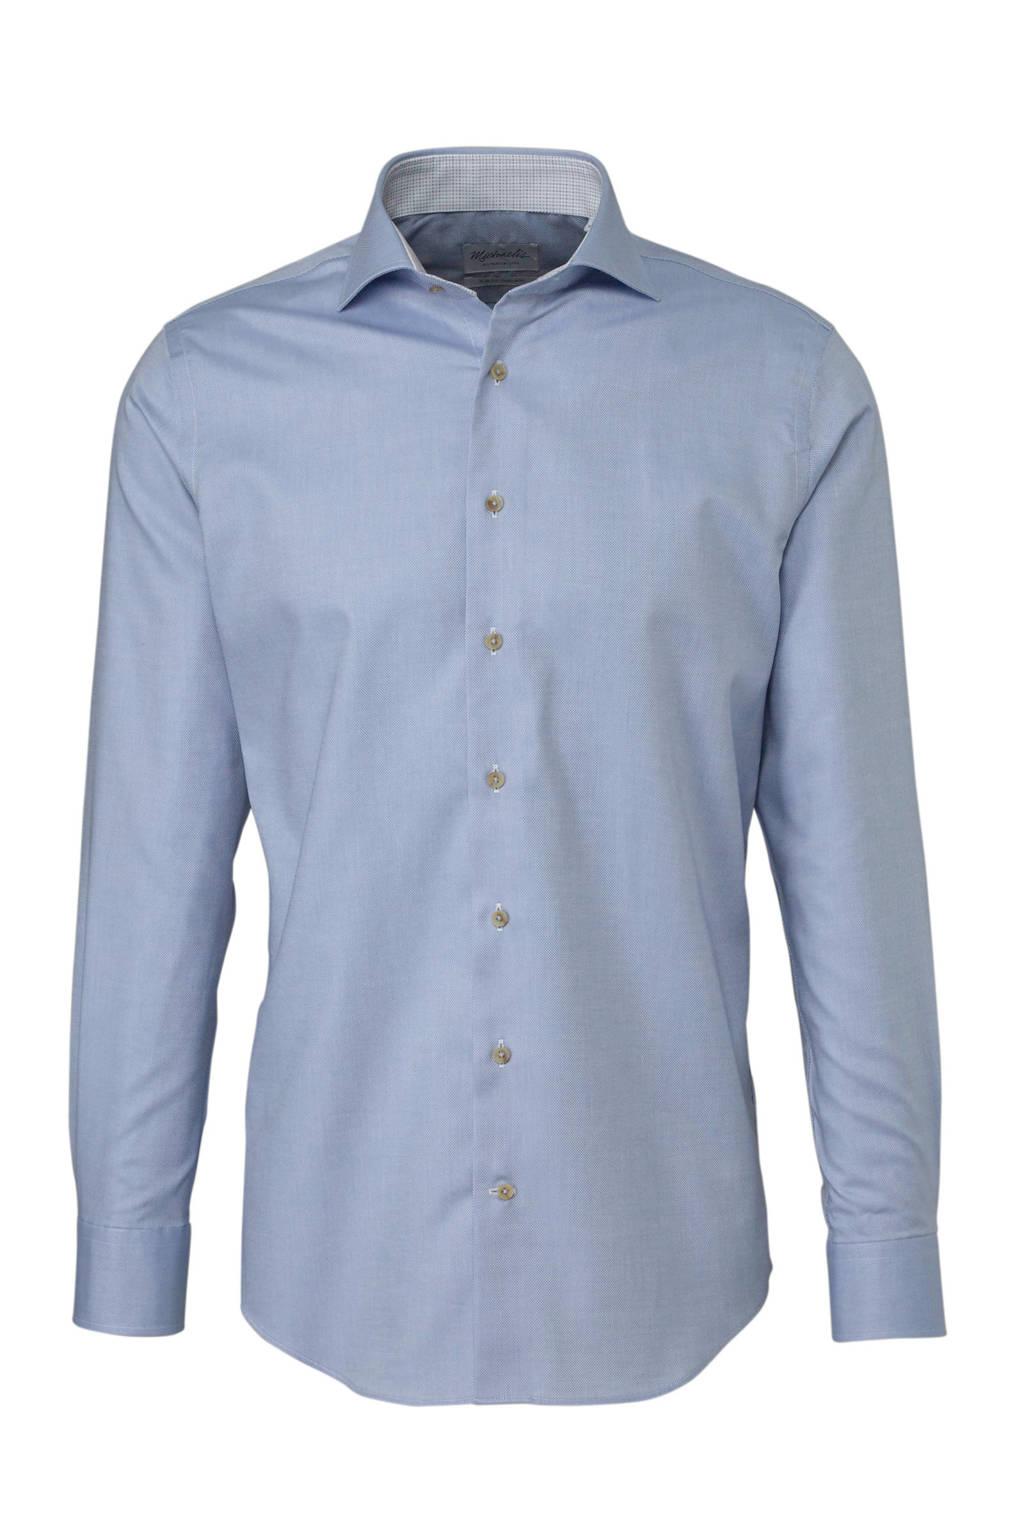 Michaelis slim fit overhemd, Blauw/wit